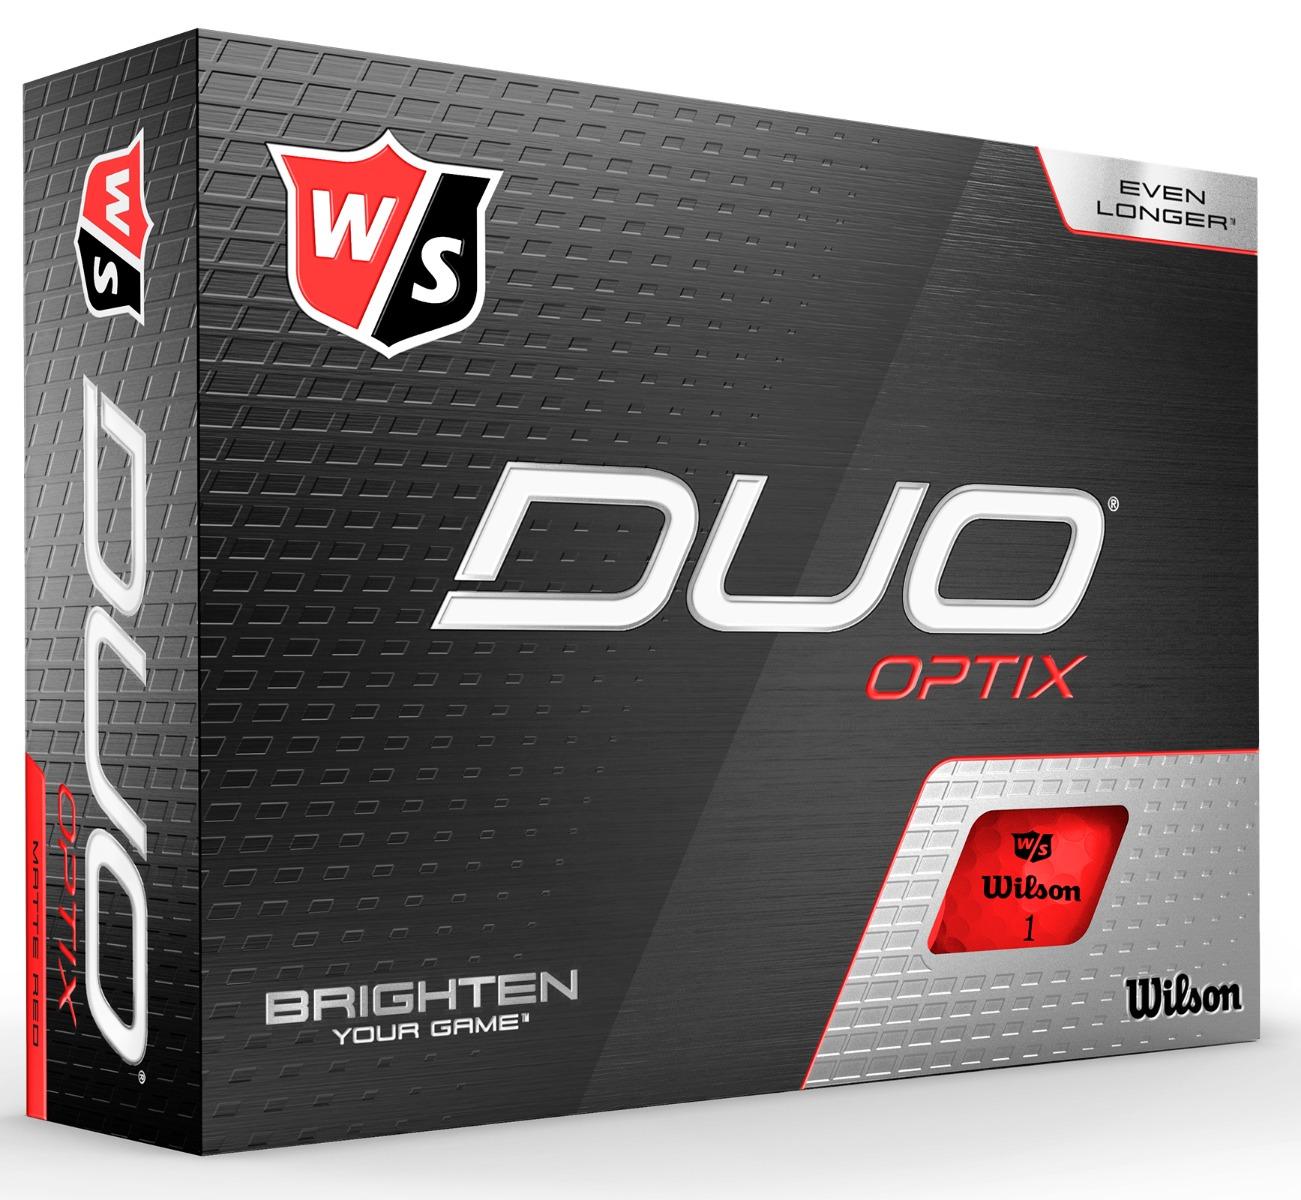 https://www.best4sportsballs.com/pub/media/catalog/product/d/u/duo_optix_red_box_600.jpg